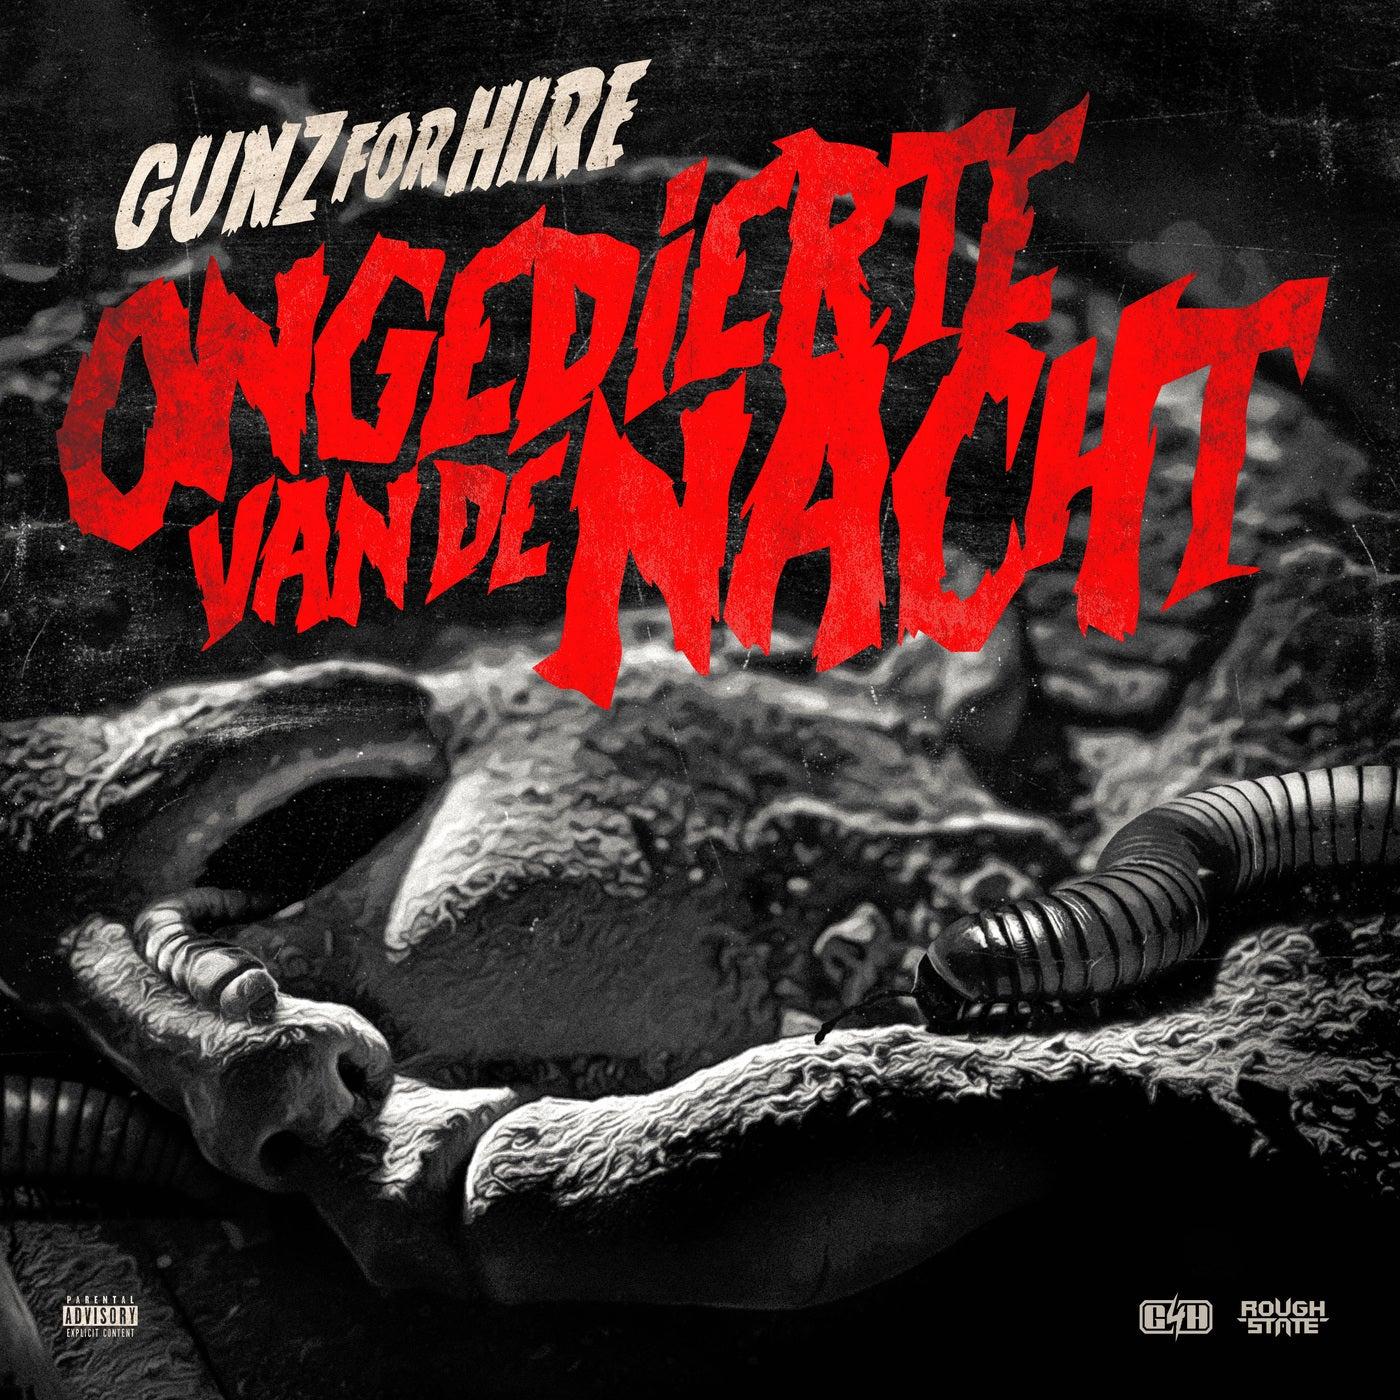 Ongedierte Van De Nacht (Extended Mix)